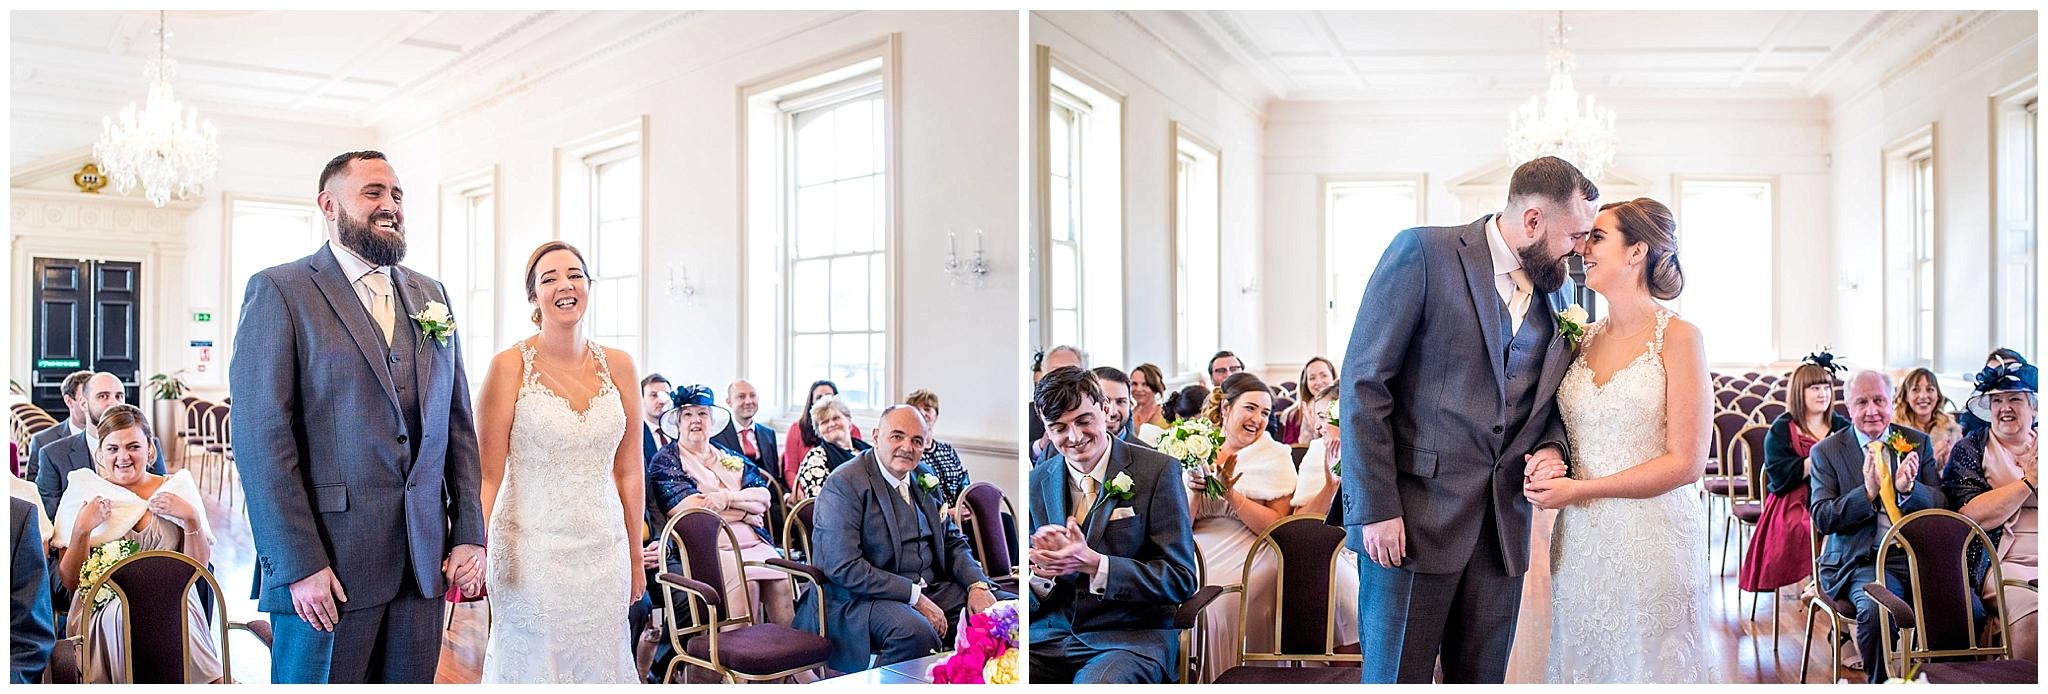 Lisa-&-Michael-Wedding-Guildhall-&-Hotel-Du-Vin-57